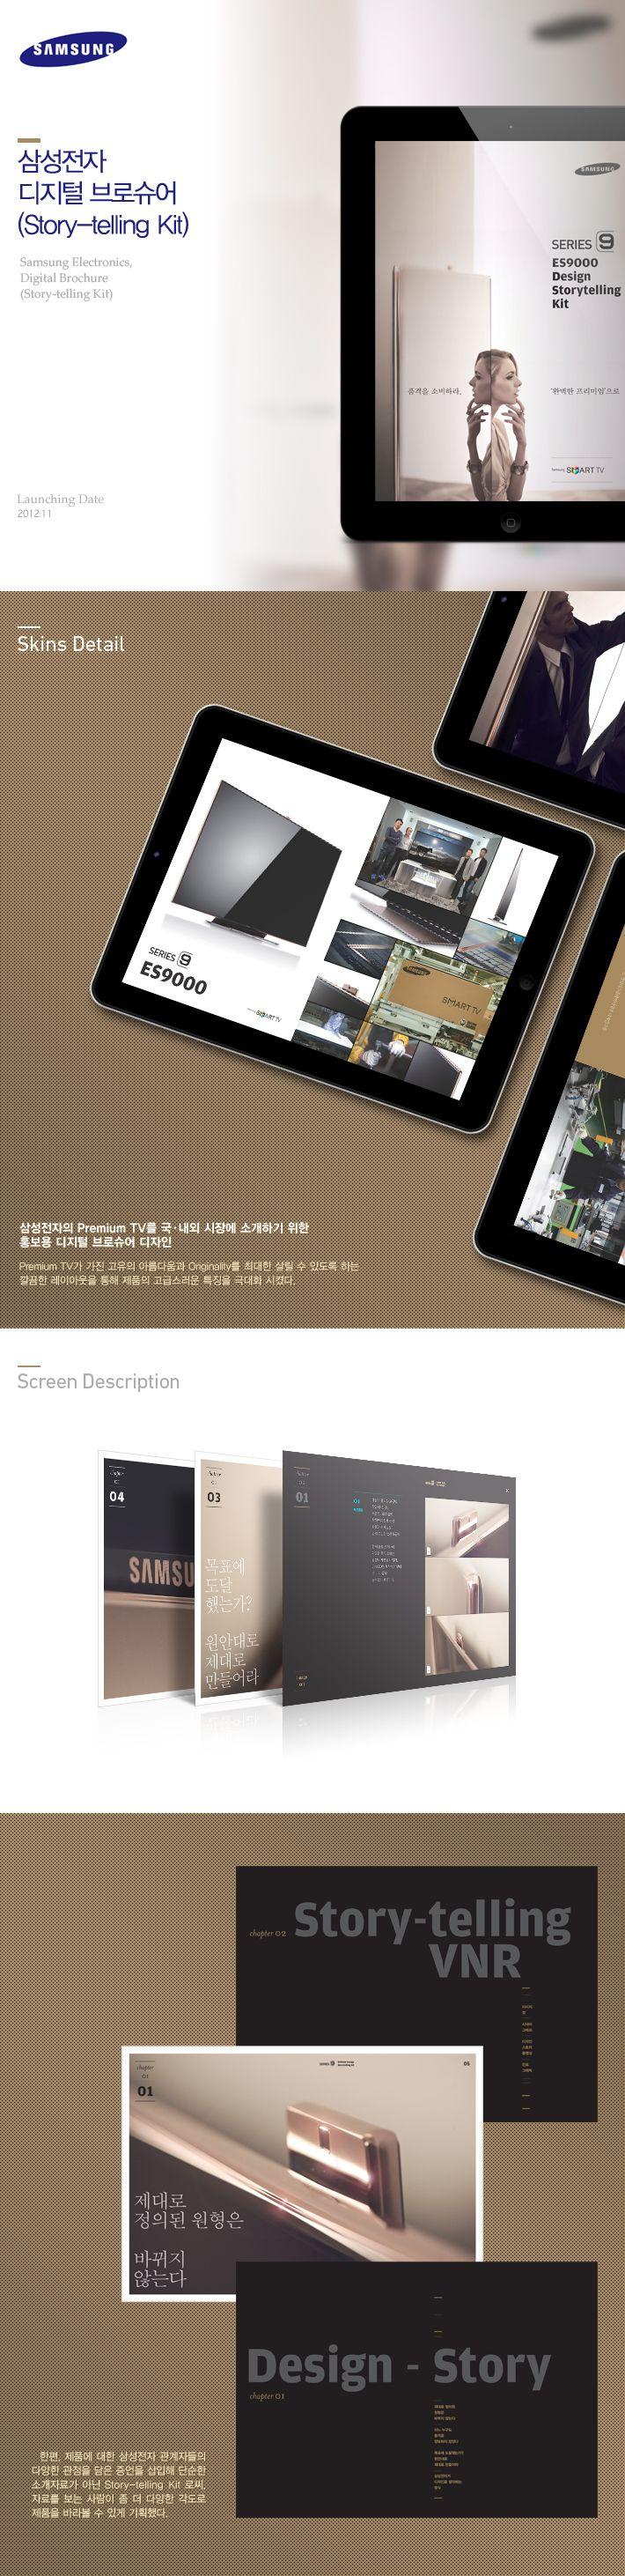 Samsung Electronics Digital Brochure(Story-telling Kit) #edacom